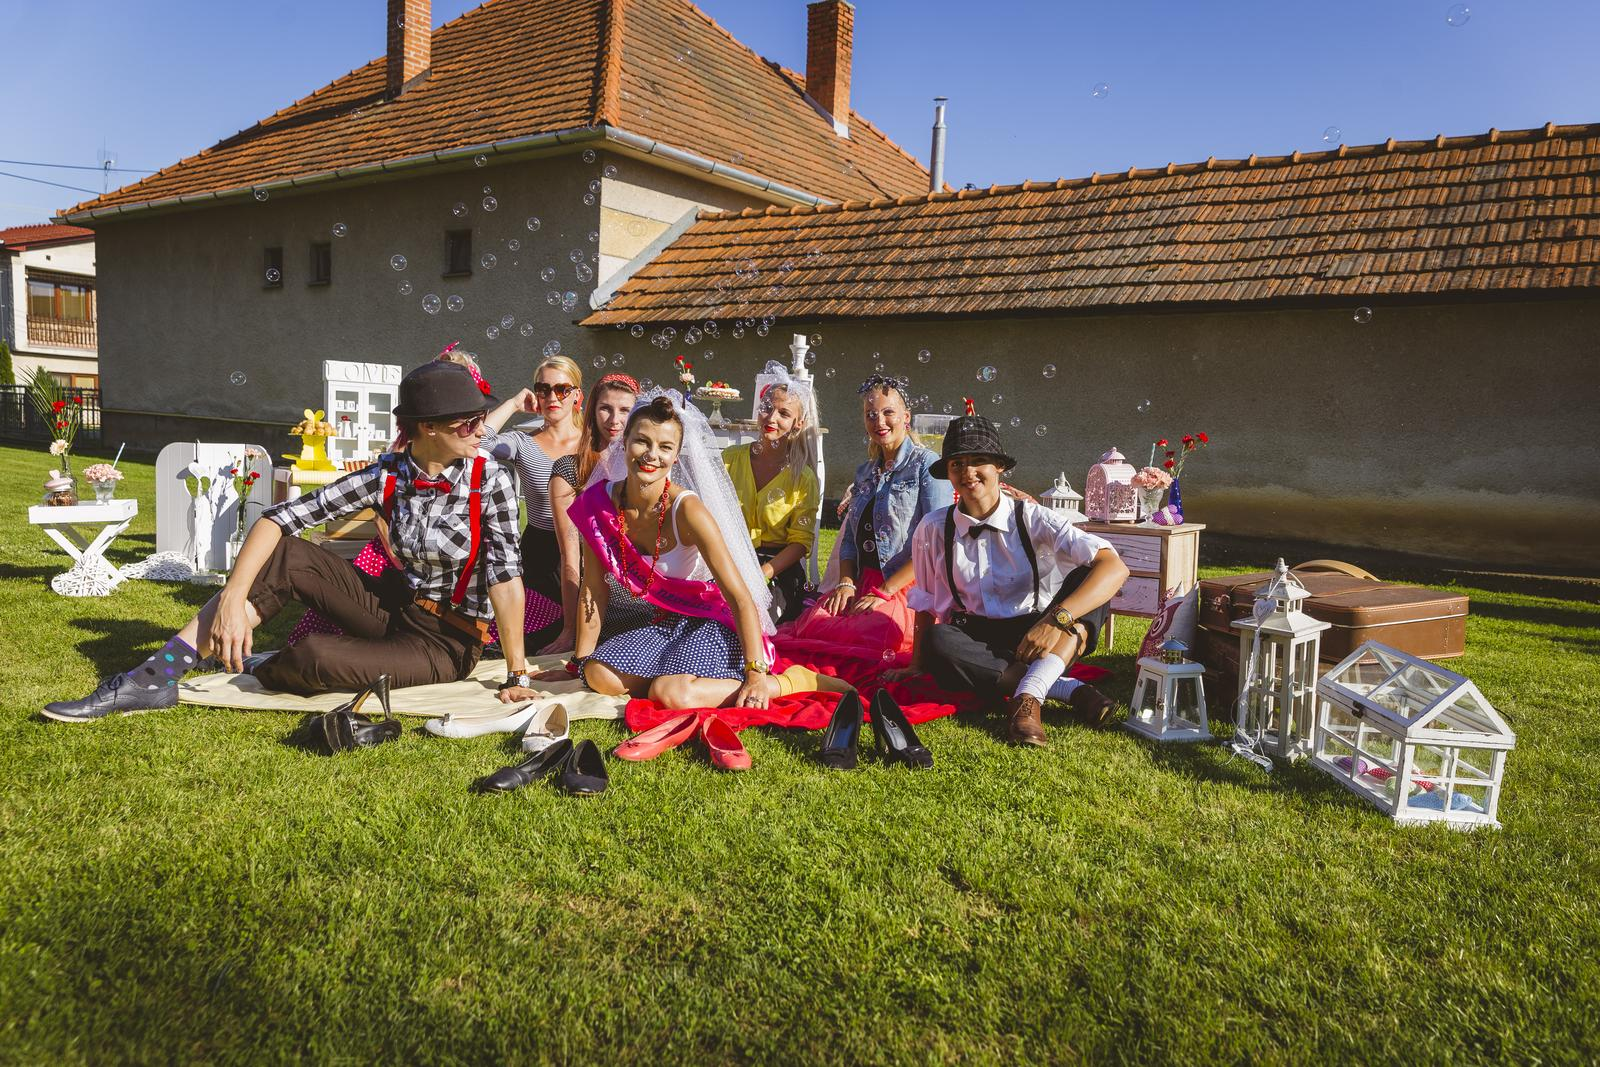 Retro rozlúčková záhradná párty :D - Obrázok č. 42